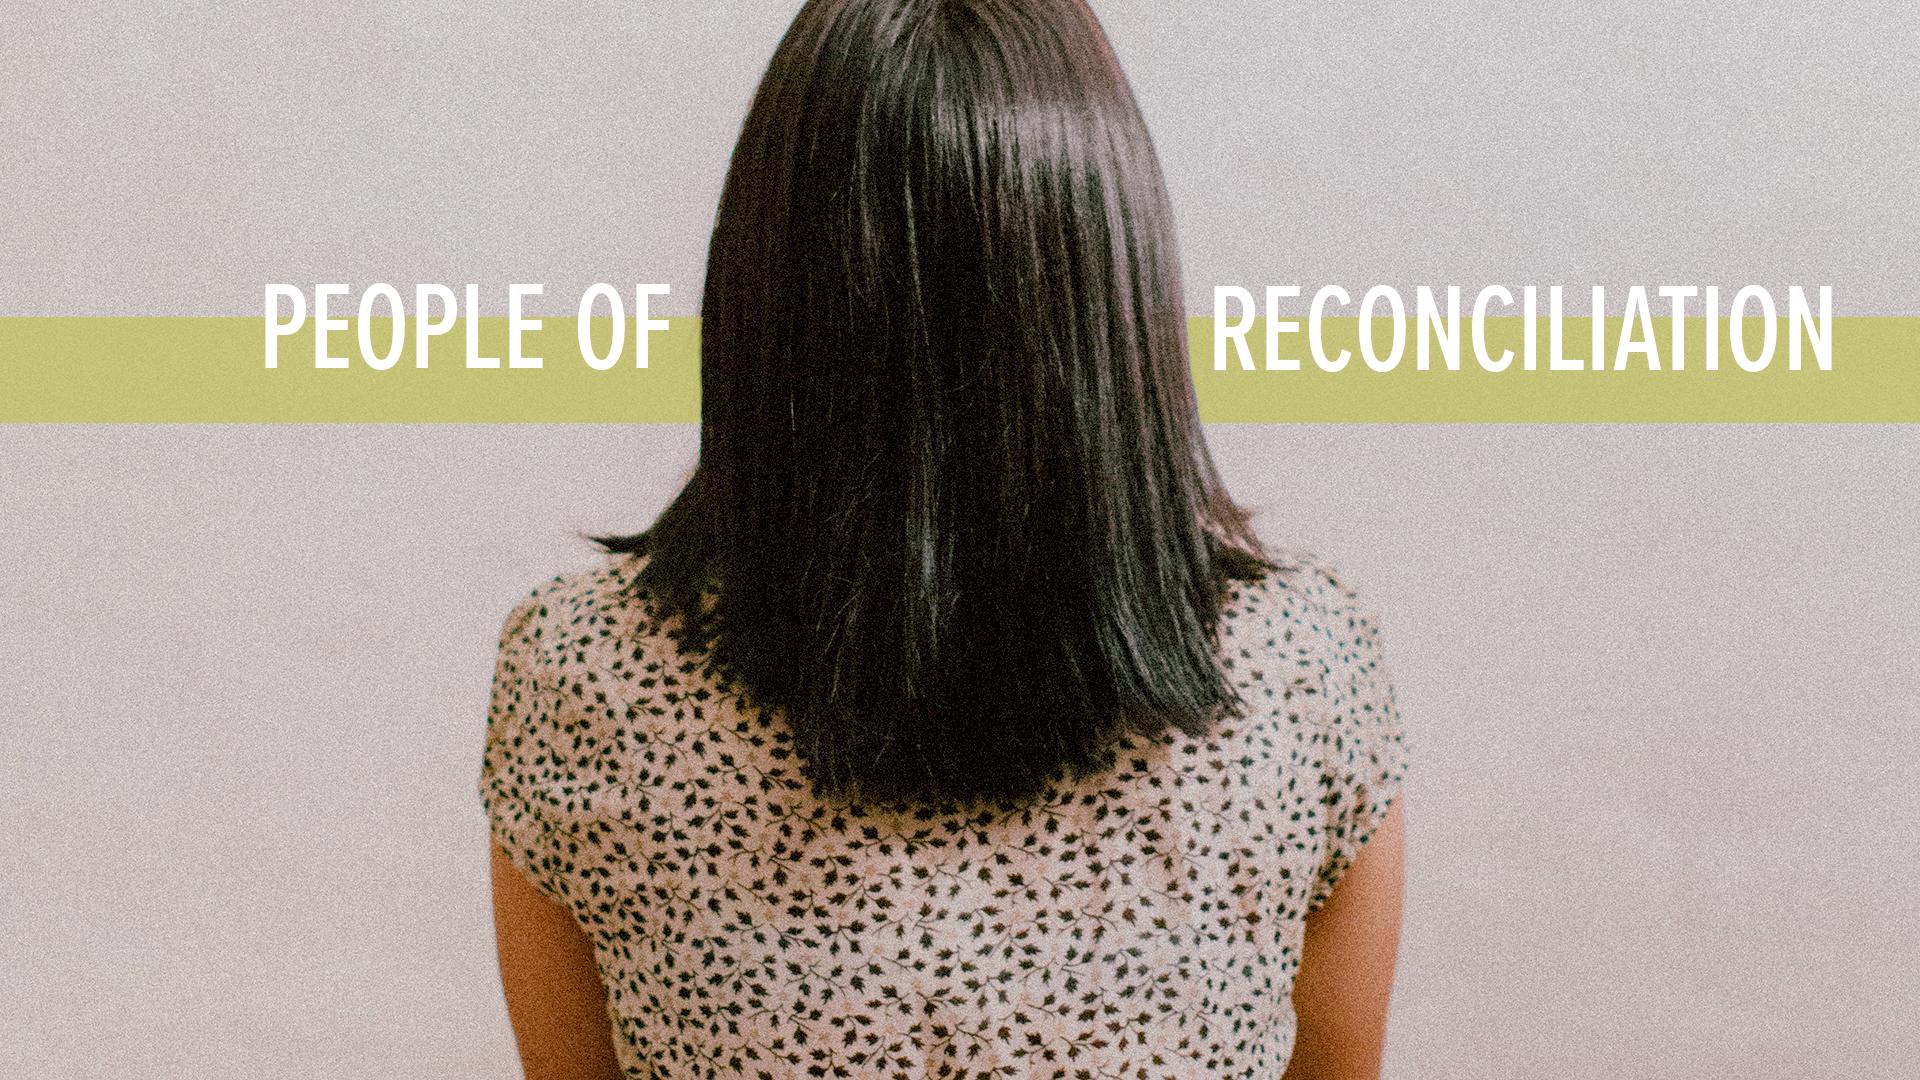 PeopleOfReconciliation.jpg